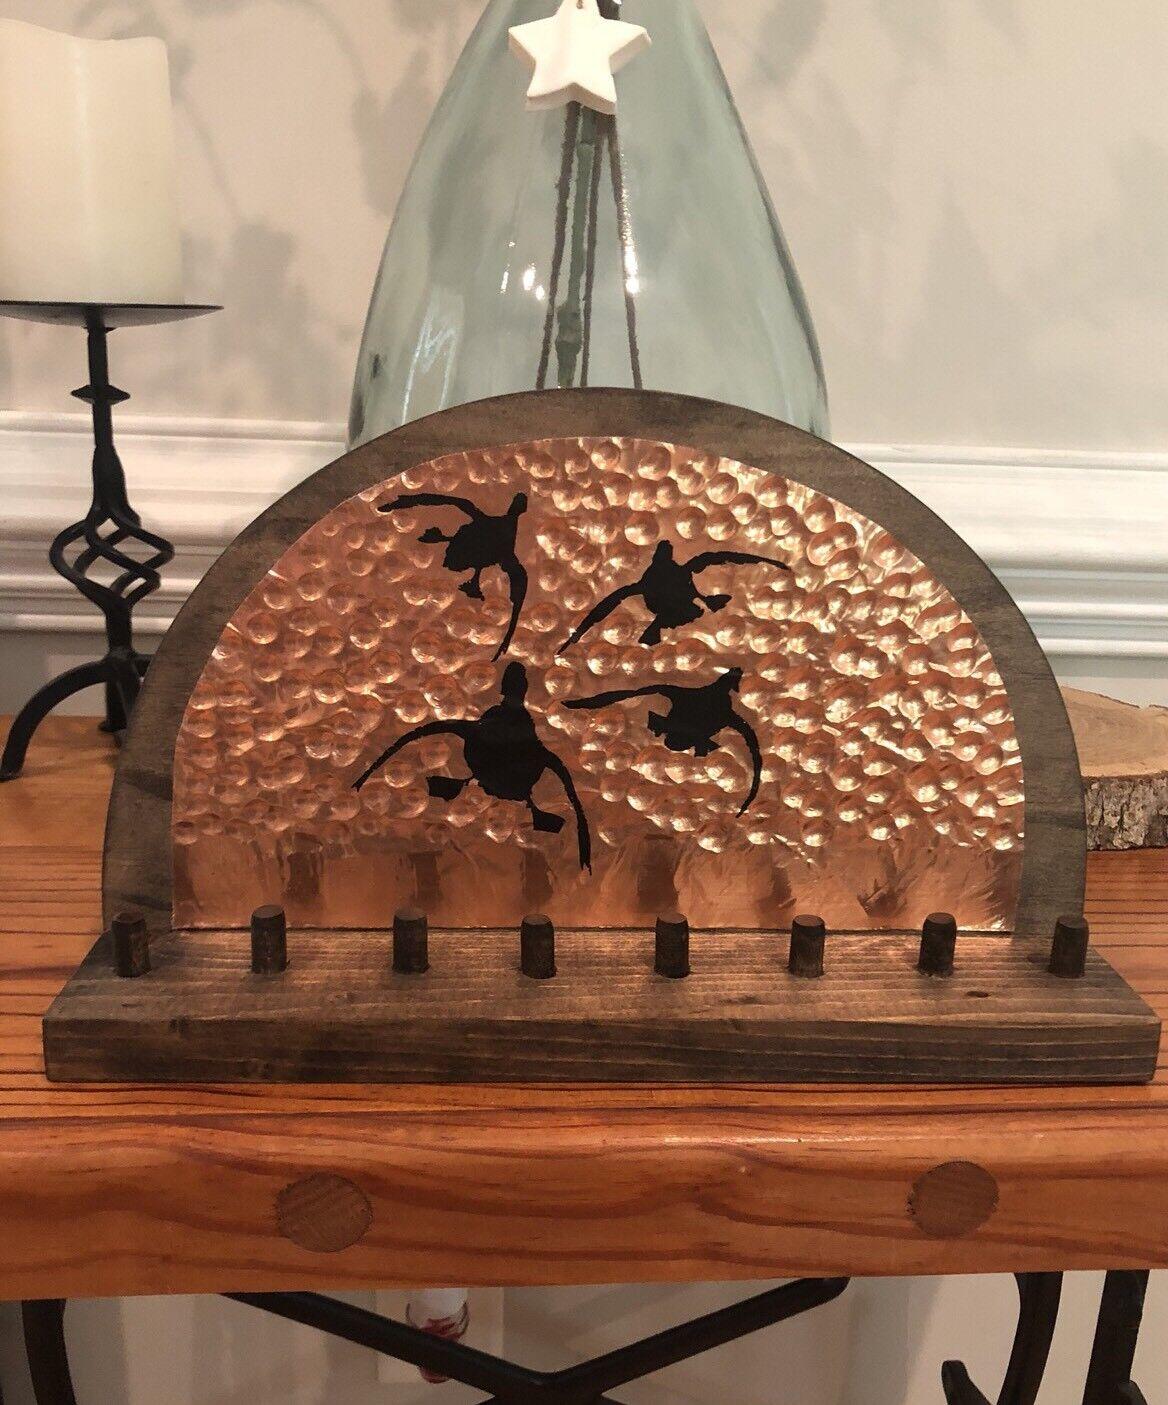 Patos titular de cobre Soporte de exhibición Decoración de Madera de Regalo de caza de aves acuáticas Rústico